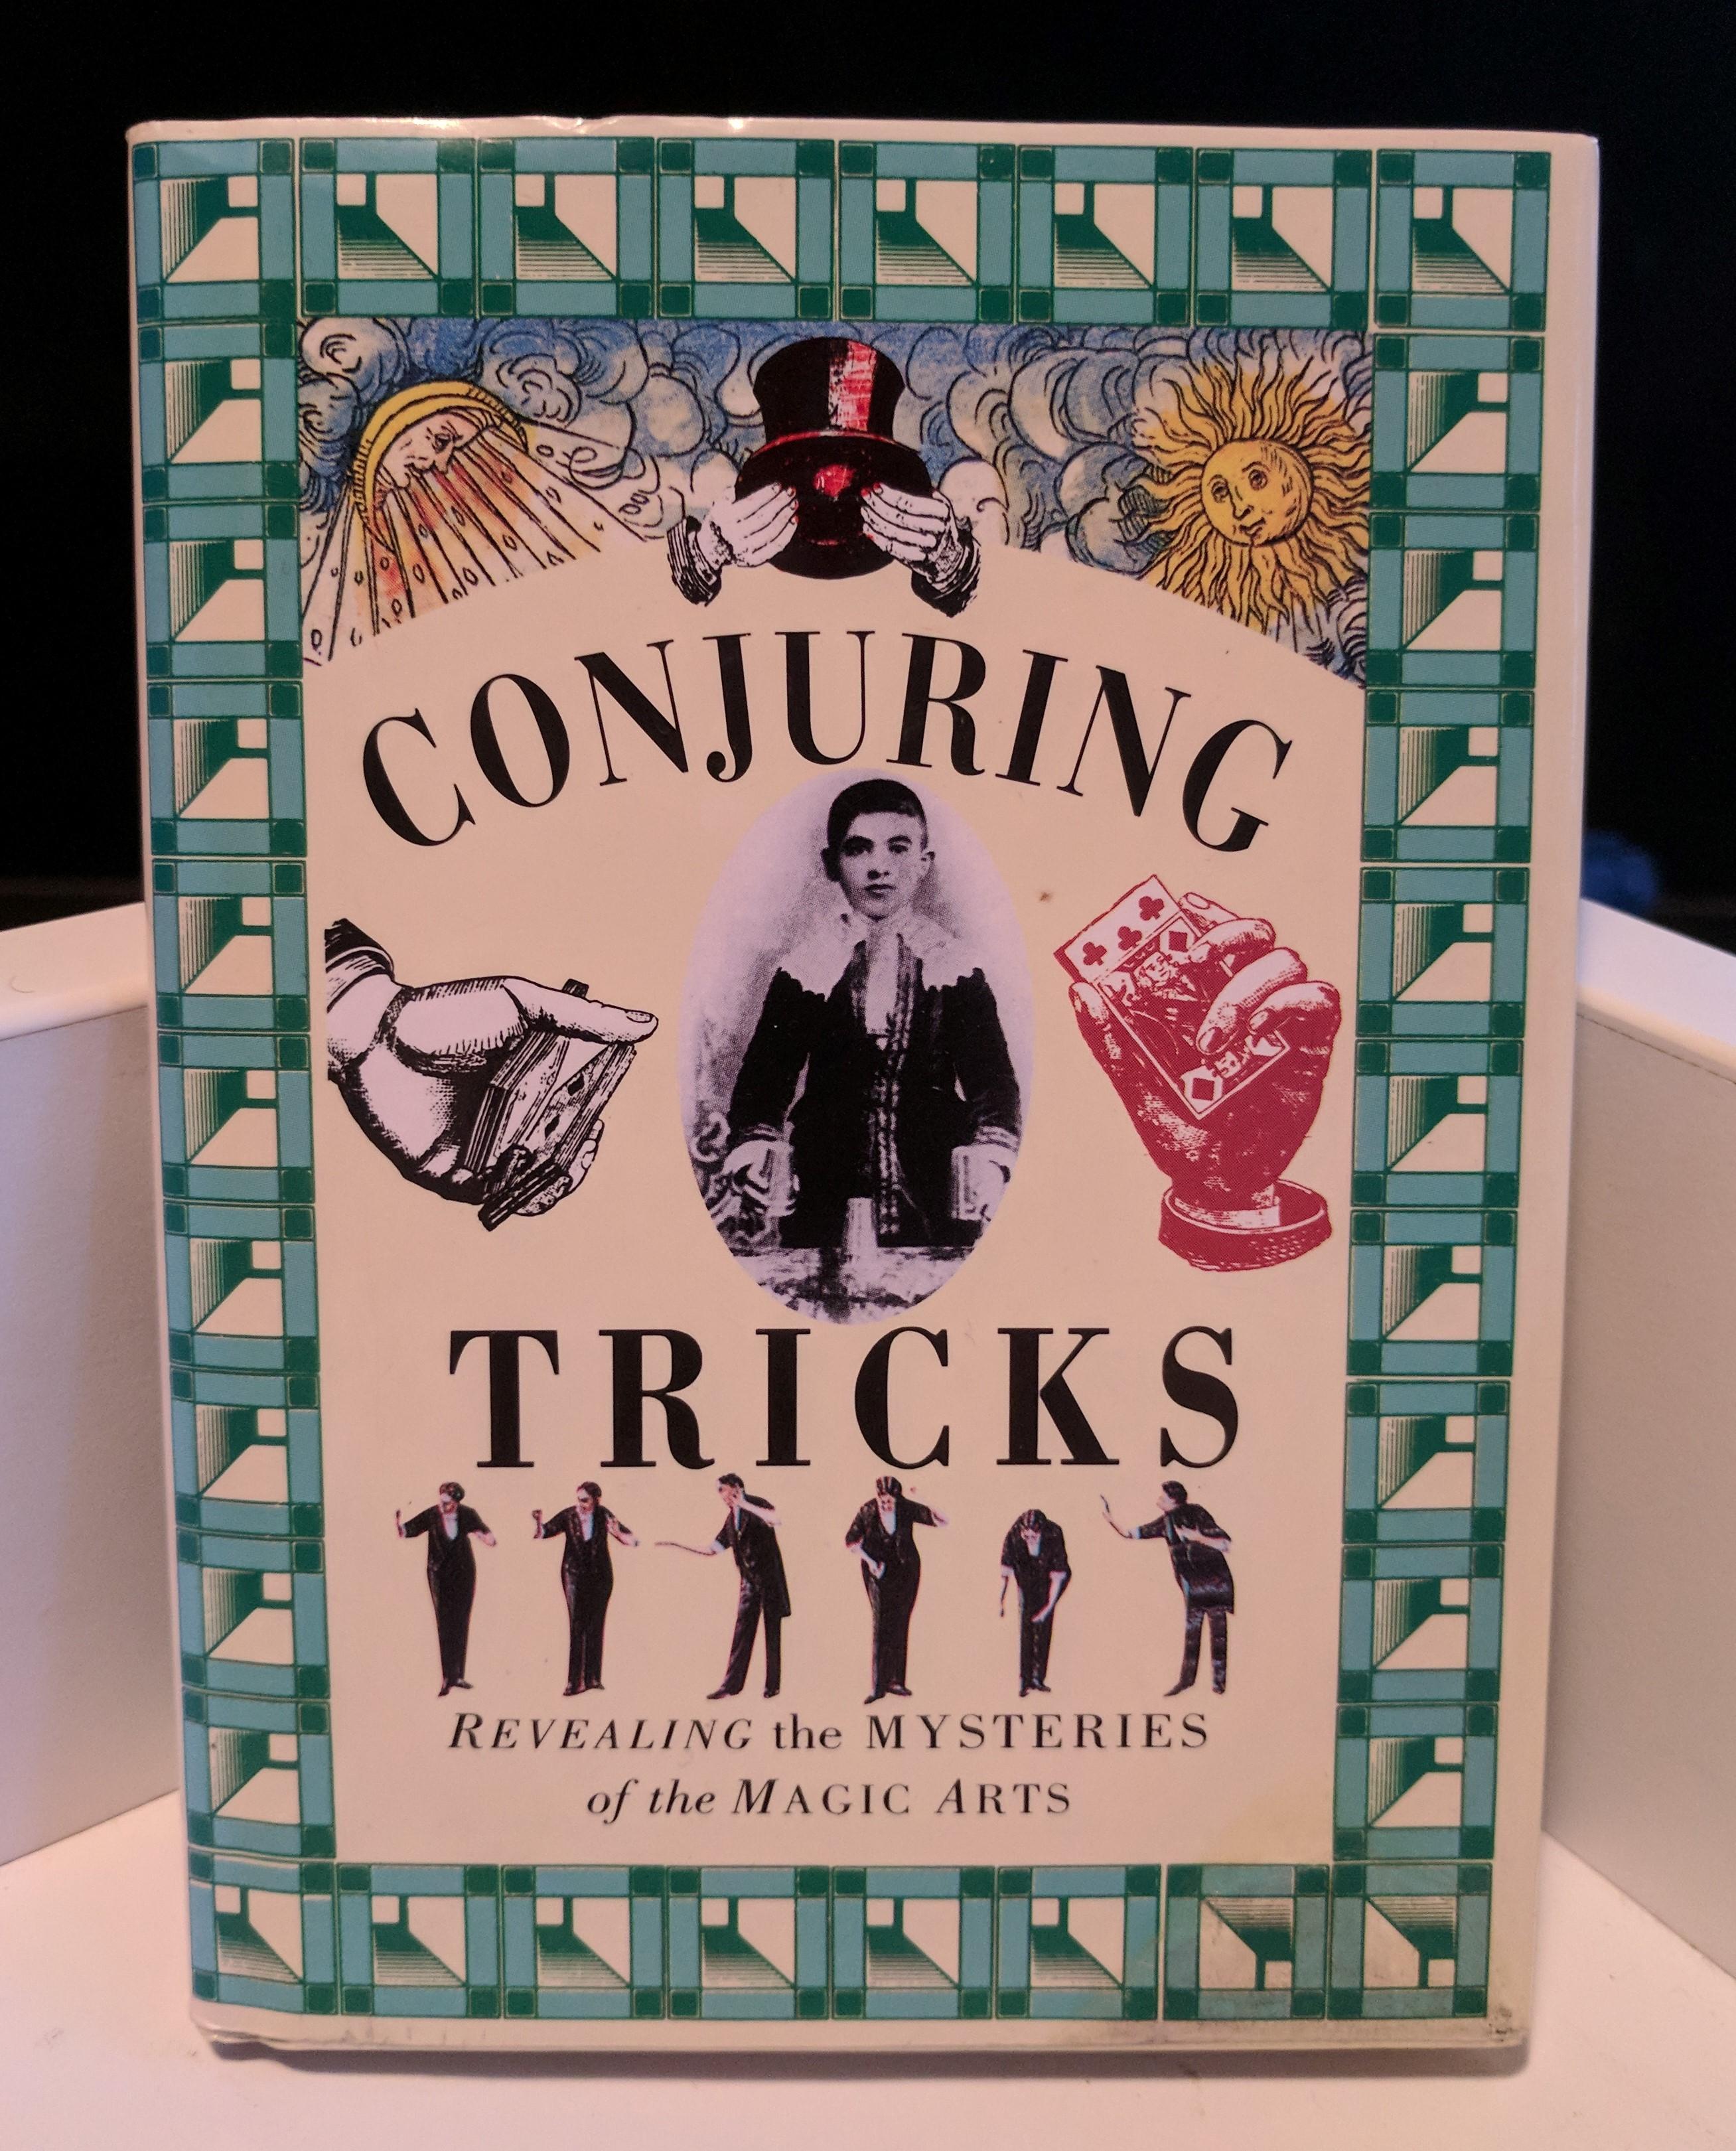 Conjuring Tricks